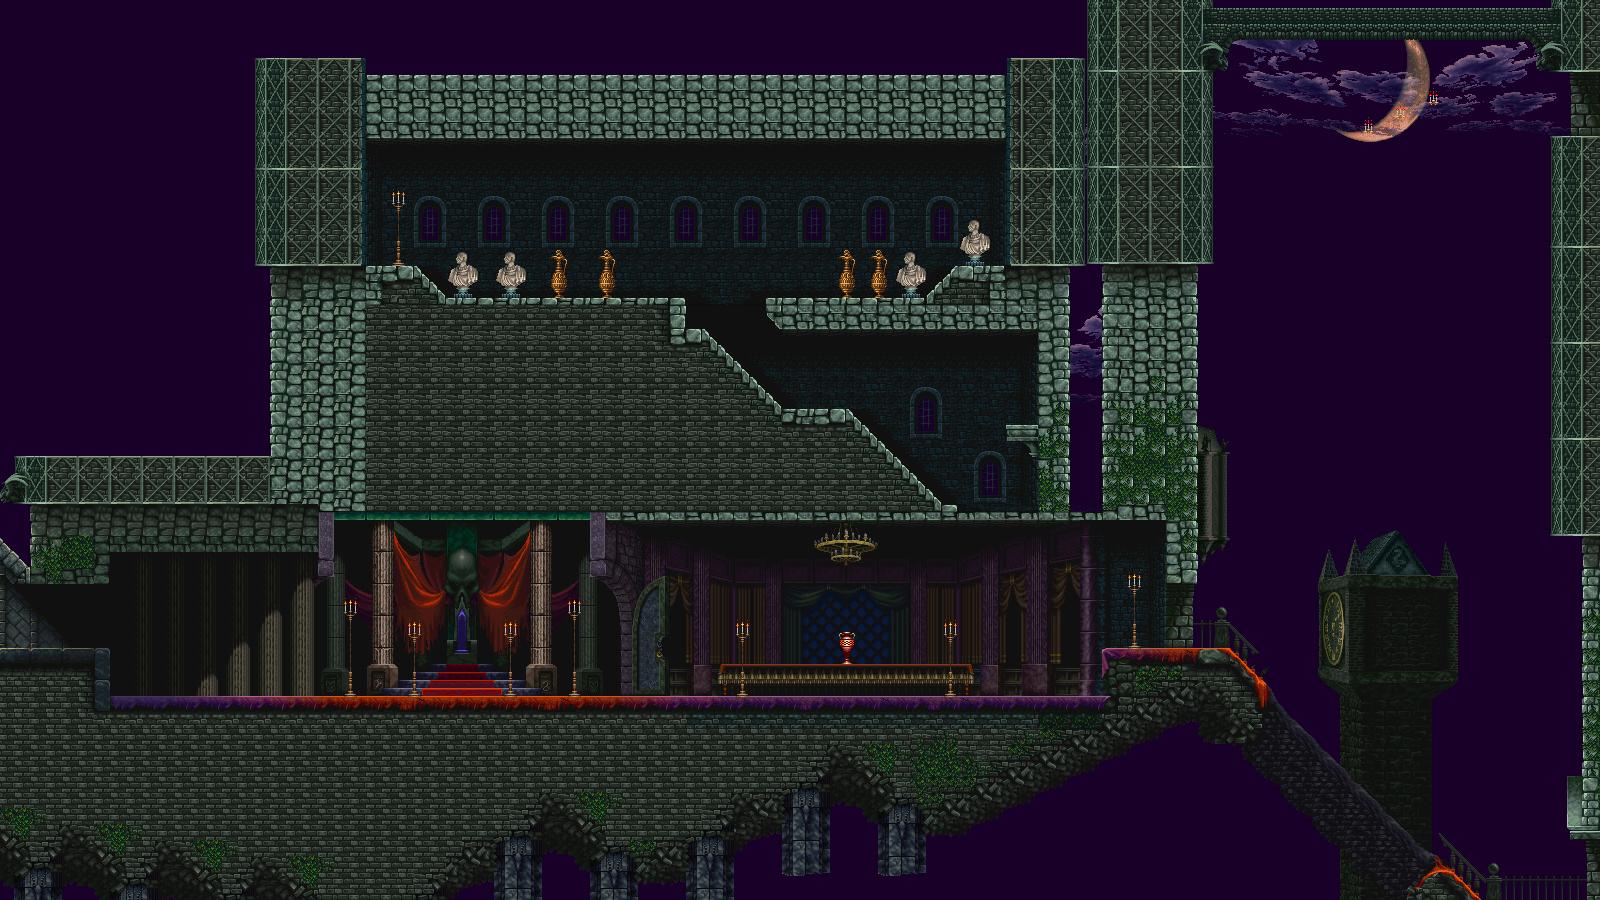 custom wallpaper castlevania sotn 01 by almadegato on